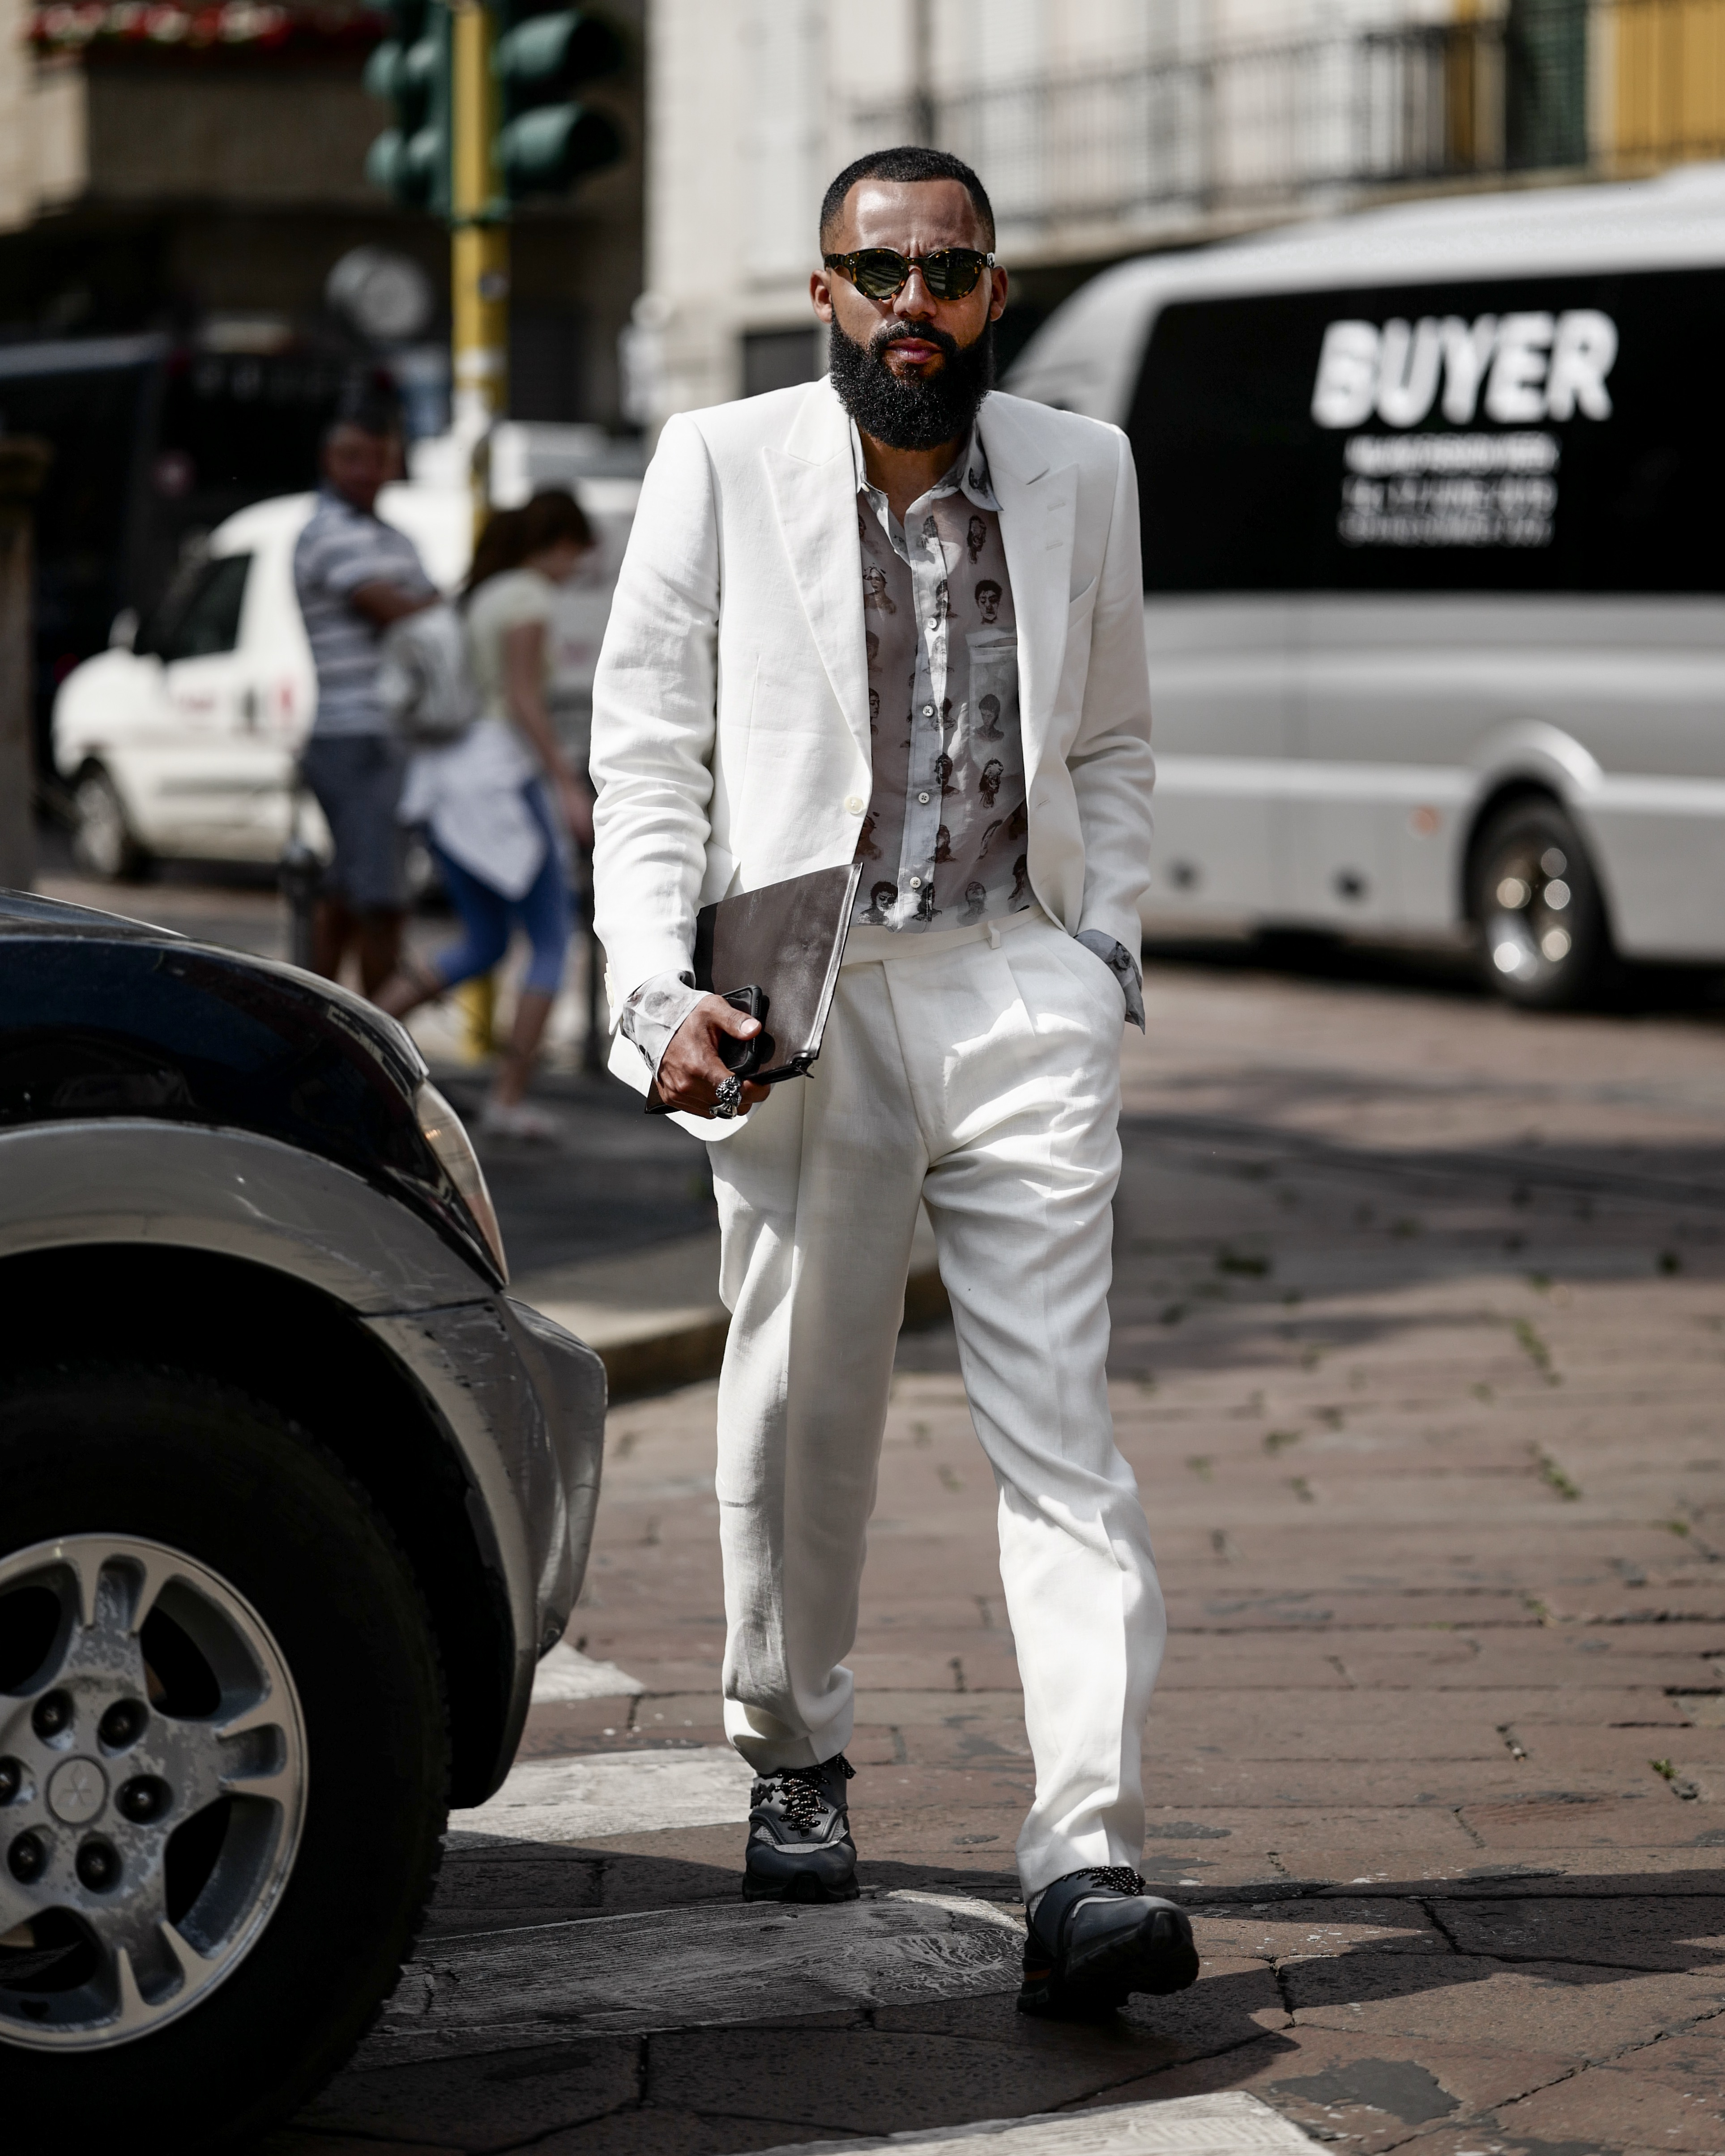 Anzug mal Casual. Mit weißen Sneakers immer gut! in 2019